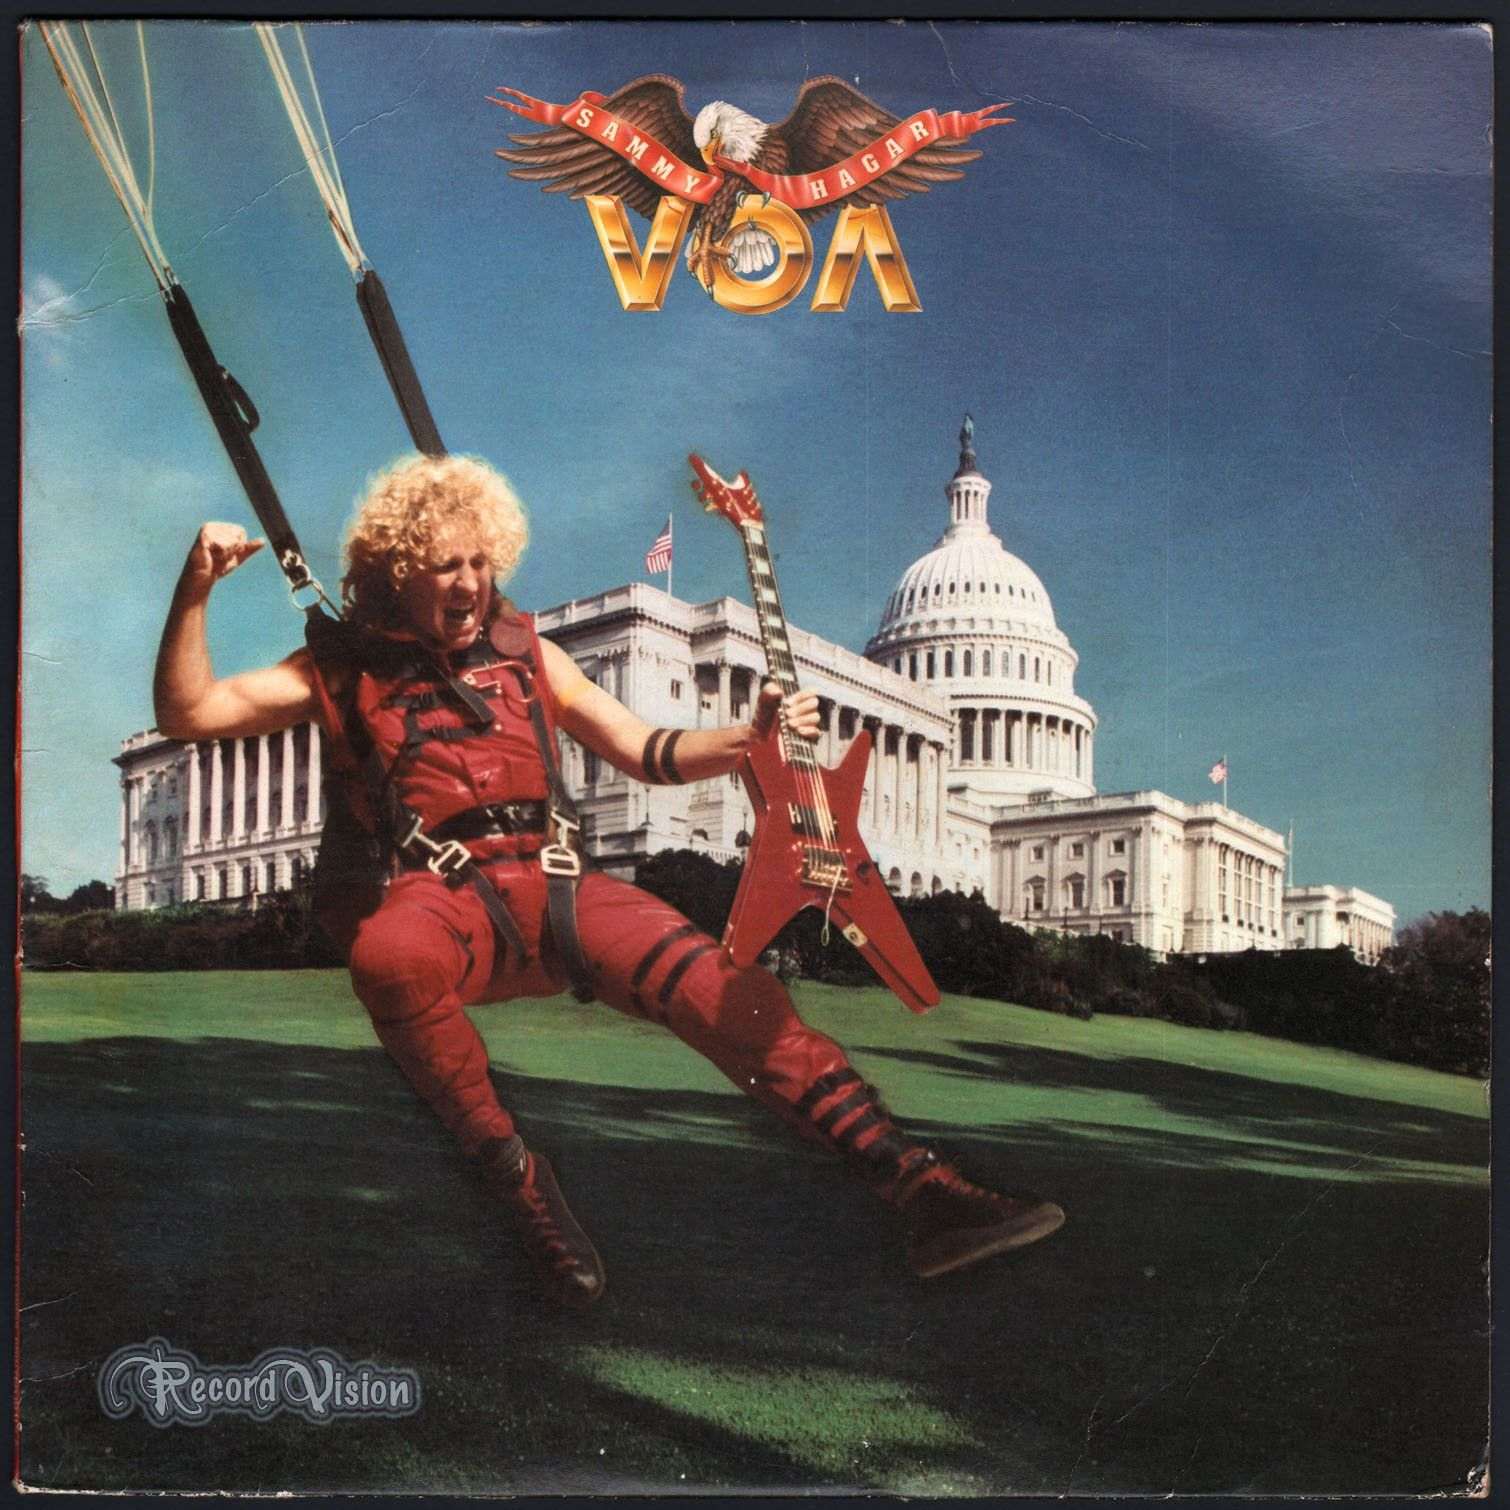 Sammy Hagar Voa 1984 Ex Ex Classic Rock Songs Sammy Hagar Rock Songs